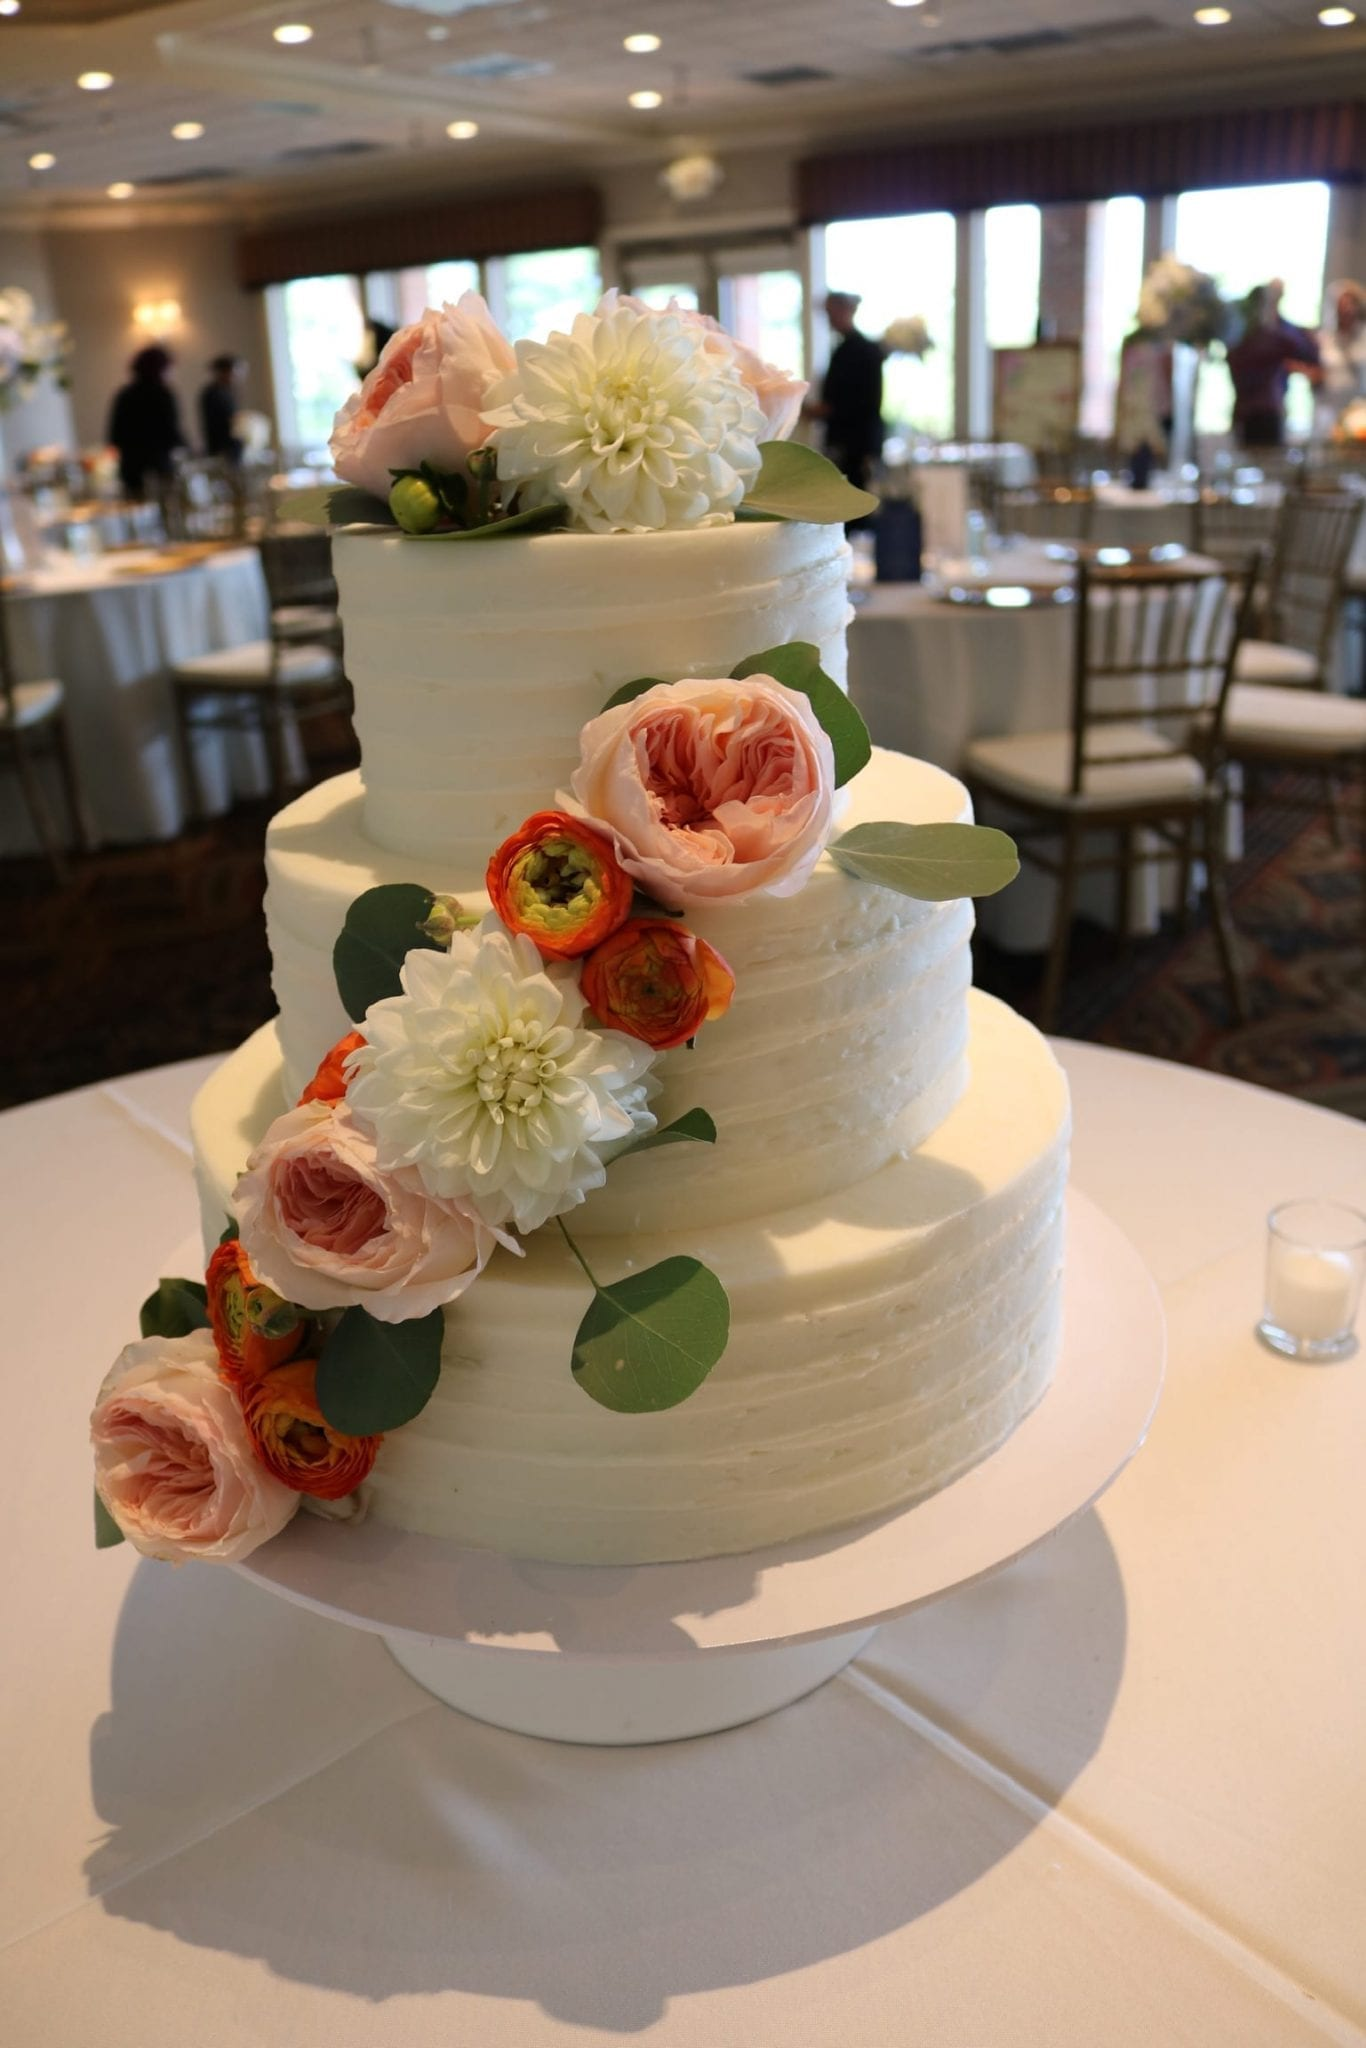 Textured Buttercream Wedding Cake with Fresh Flowers at Drees Pavillion | 3 Sweet Girls Cakery